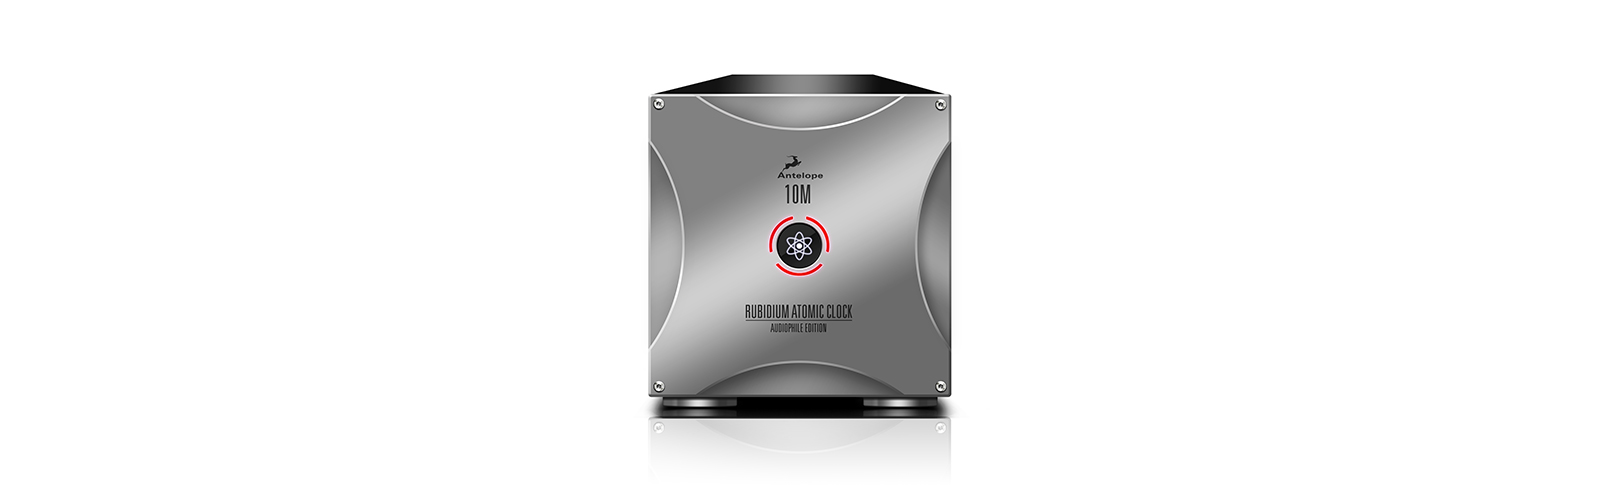 10M - 10 MHz Rubidium Atomic Reference Generator